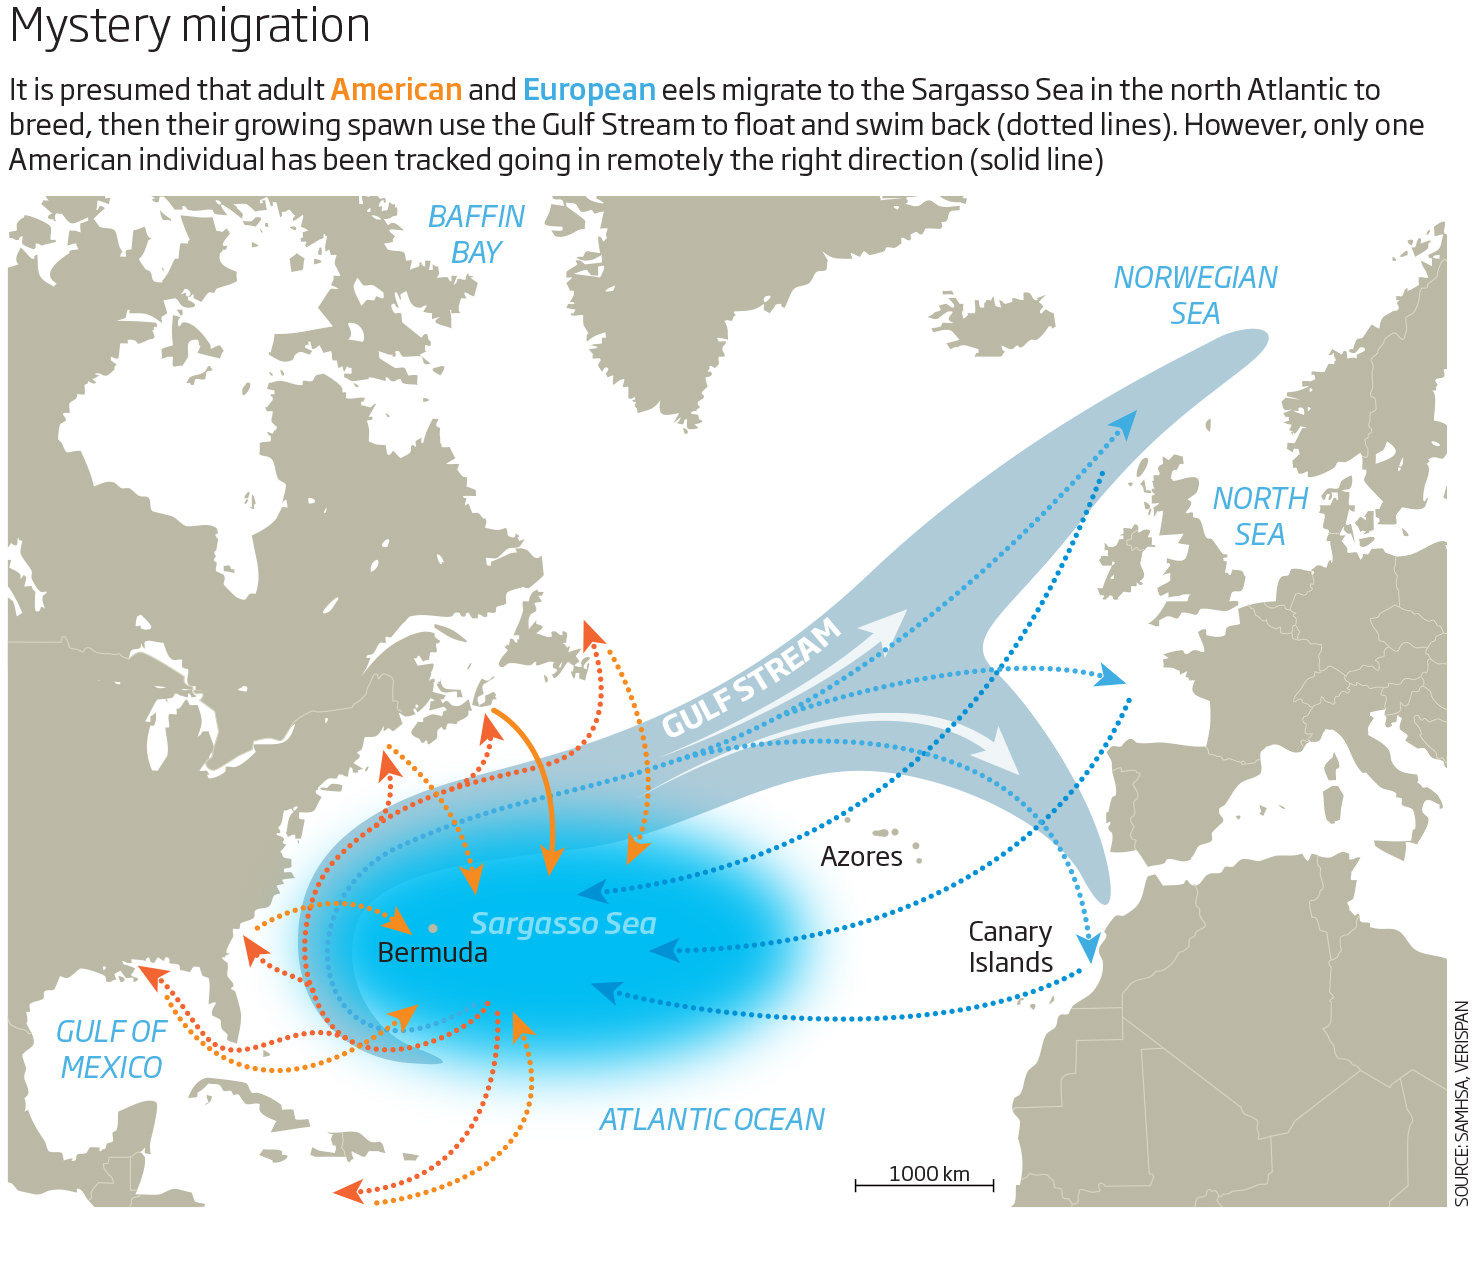 Mystery migration